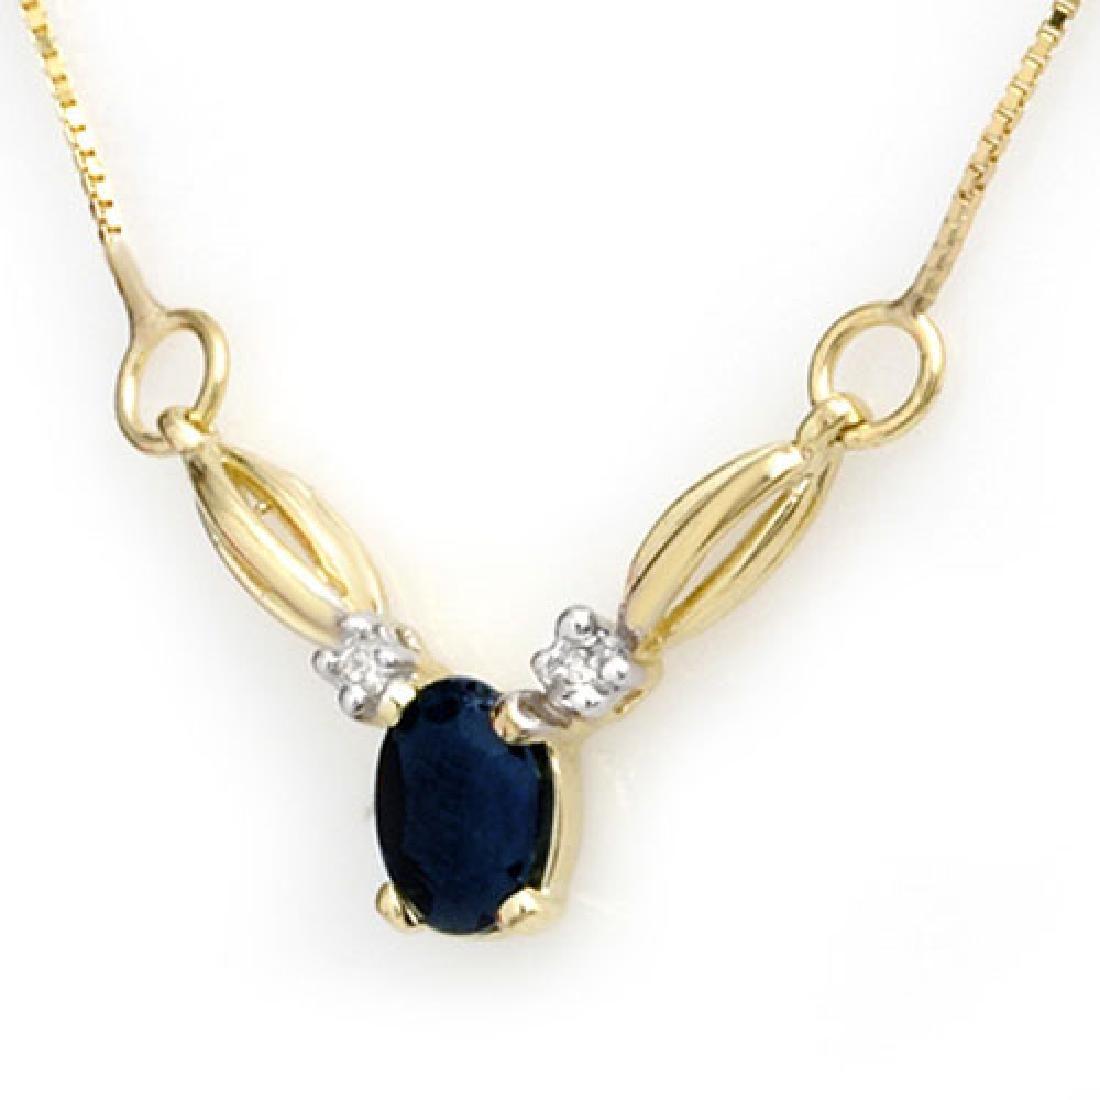 1.30 CTW Blue Sapphire & Diamond Necklace 10K Yellow